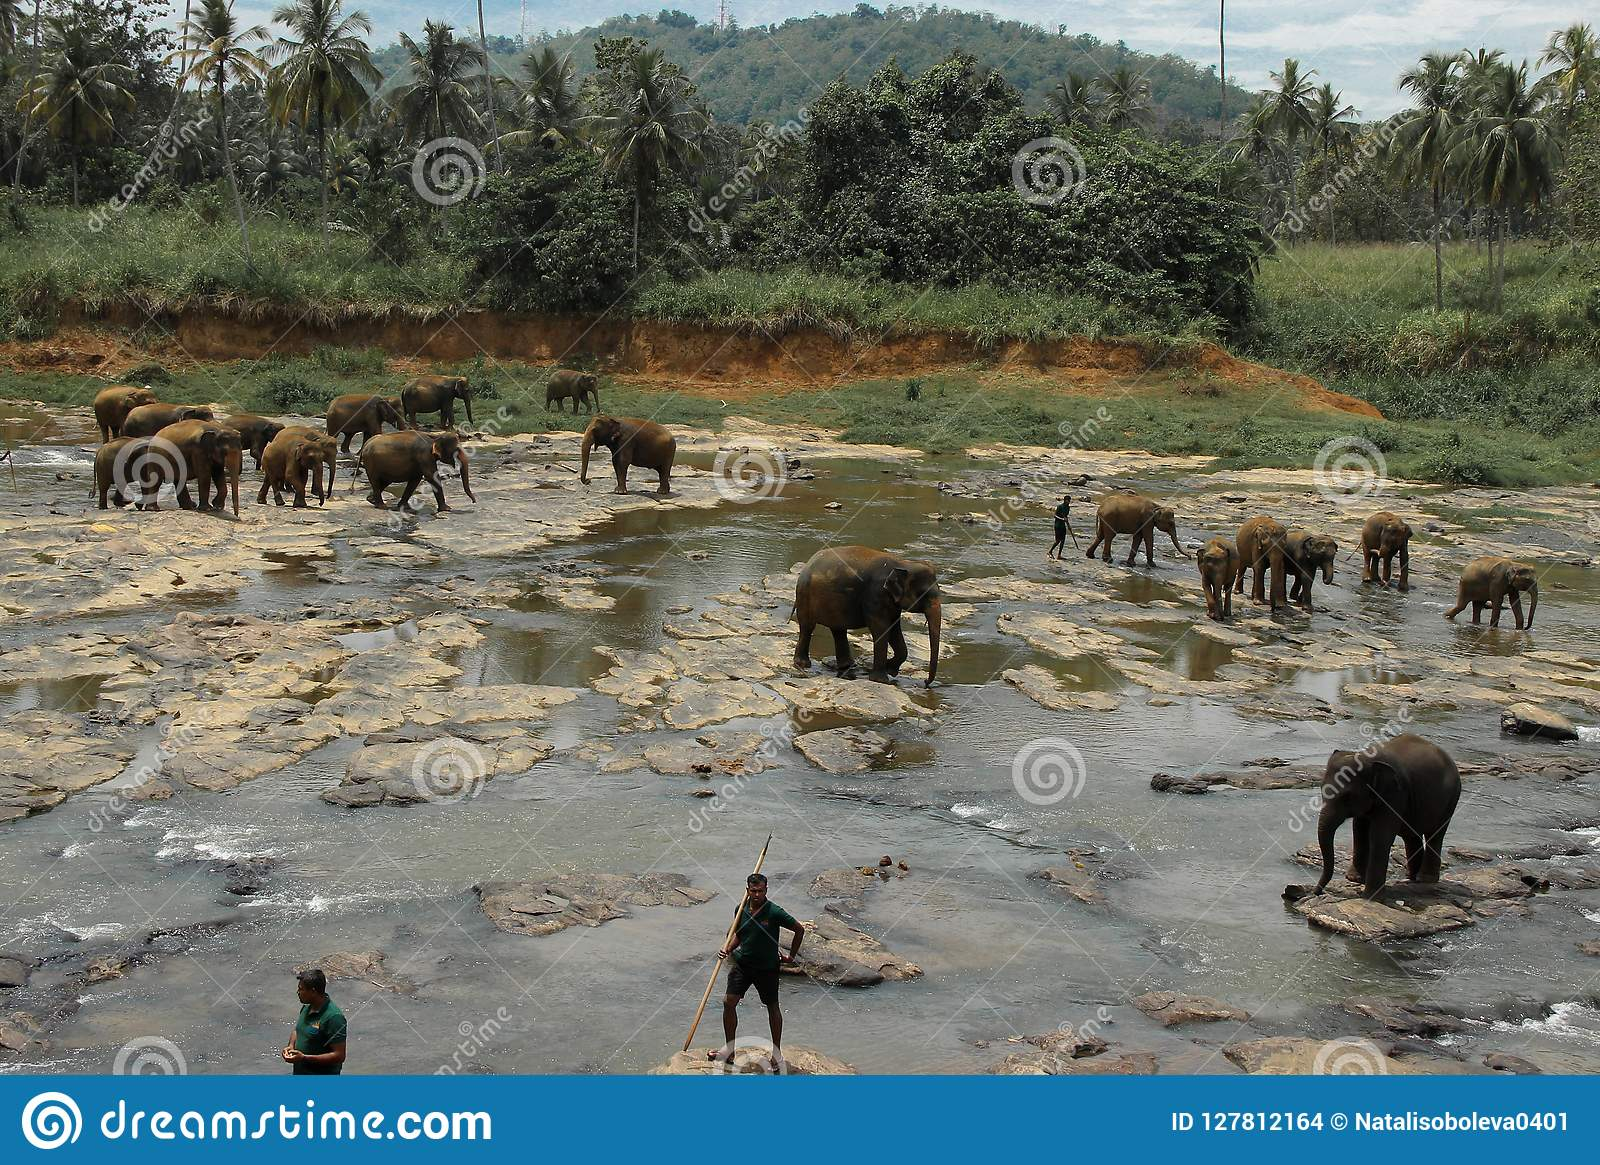 Bathing of Elephants. Sri lanka.